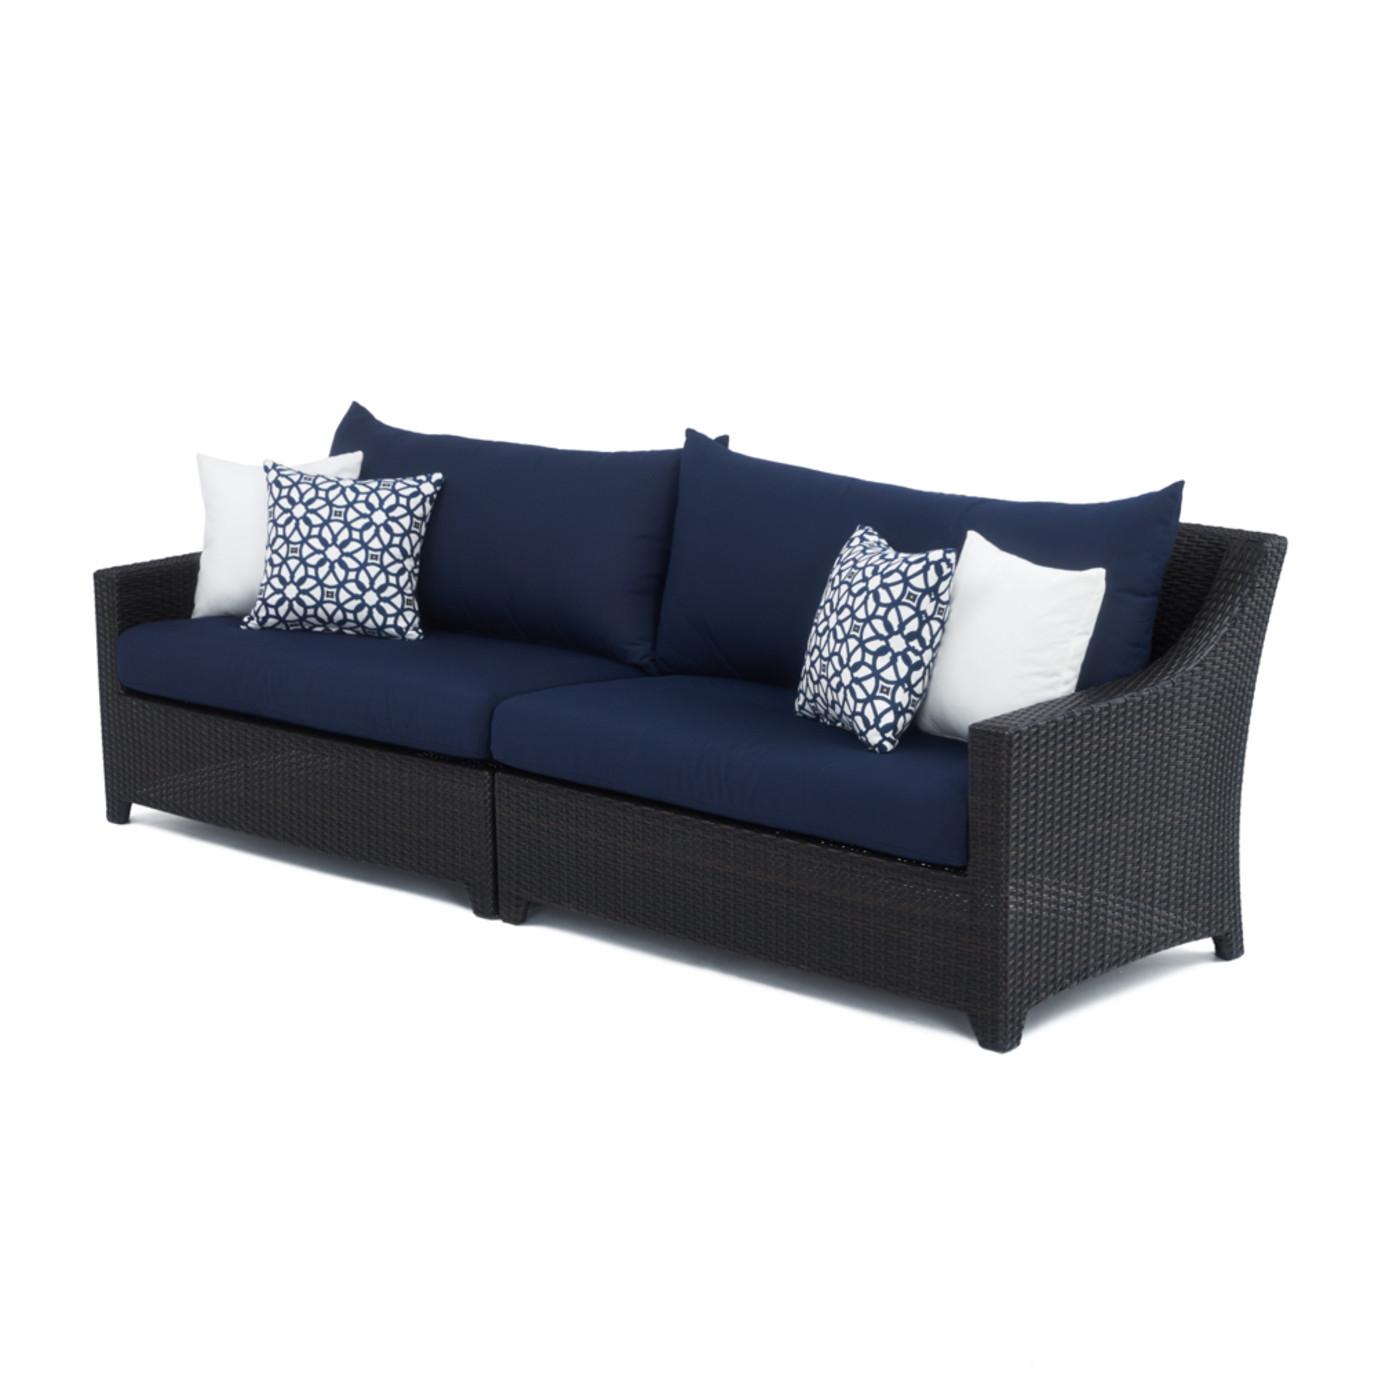 Deco™ Sofa